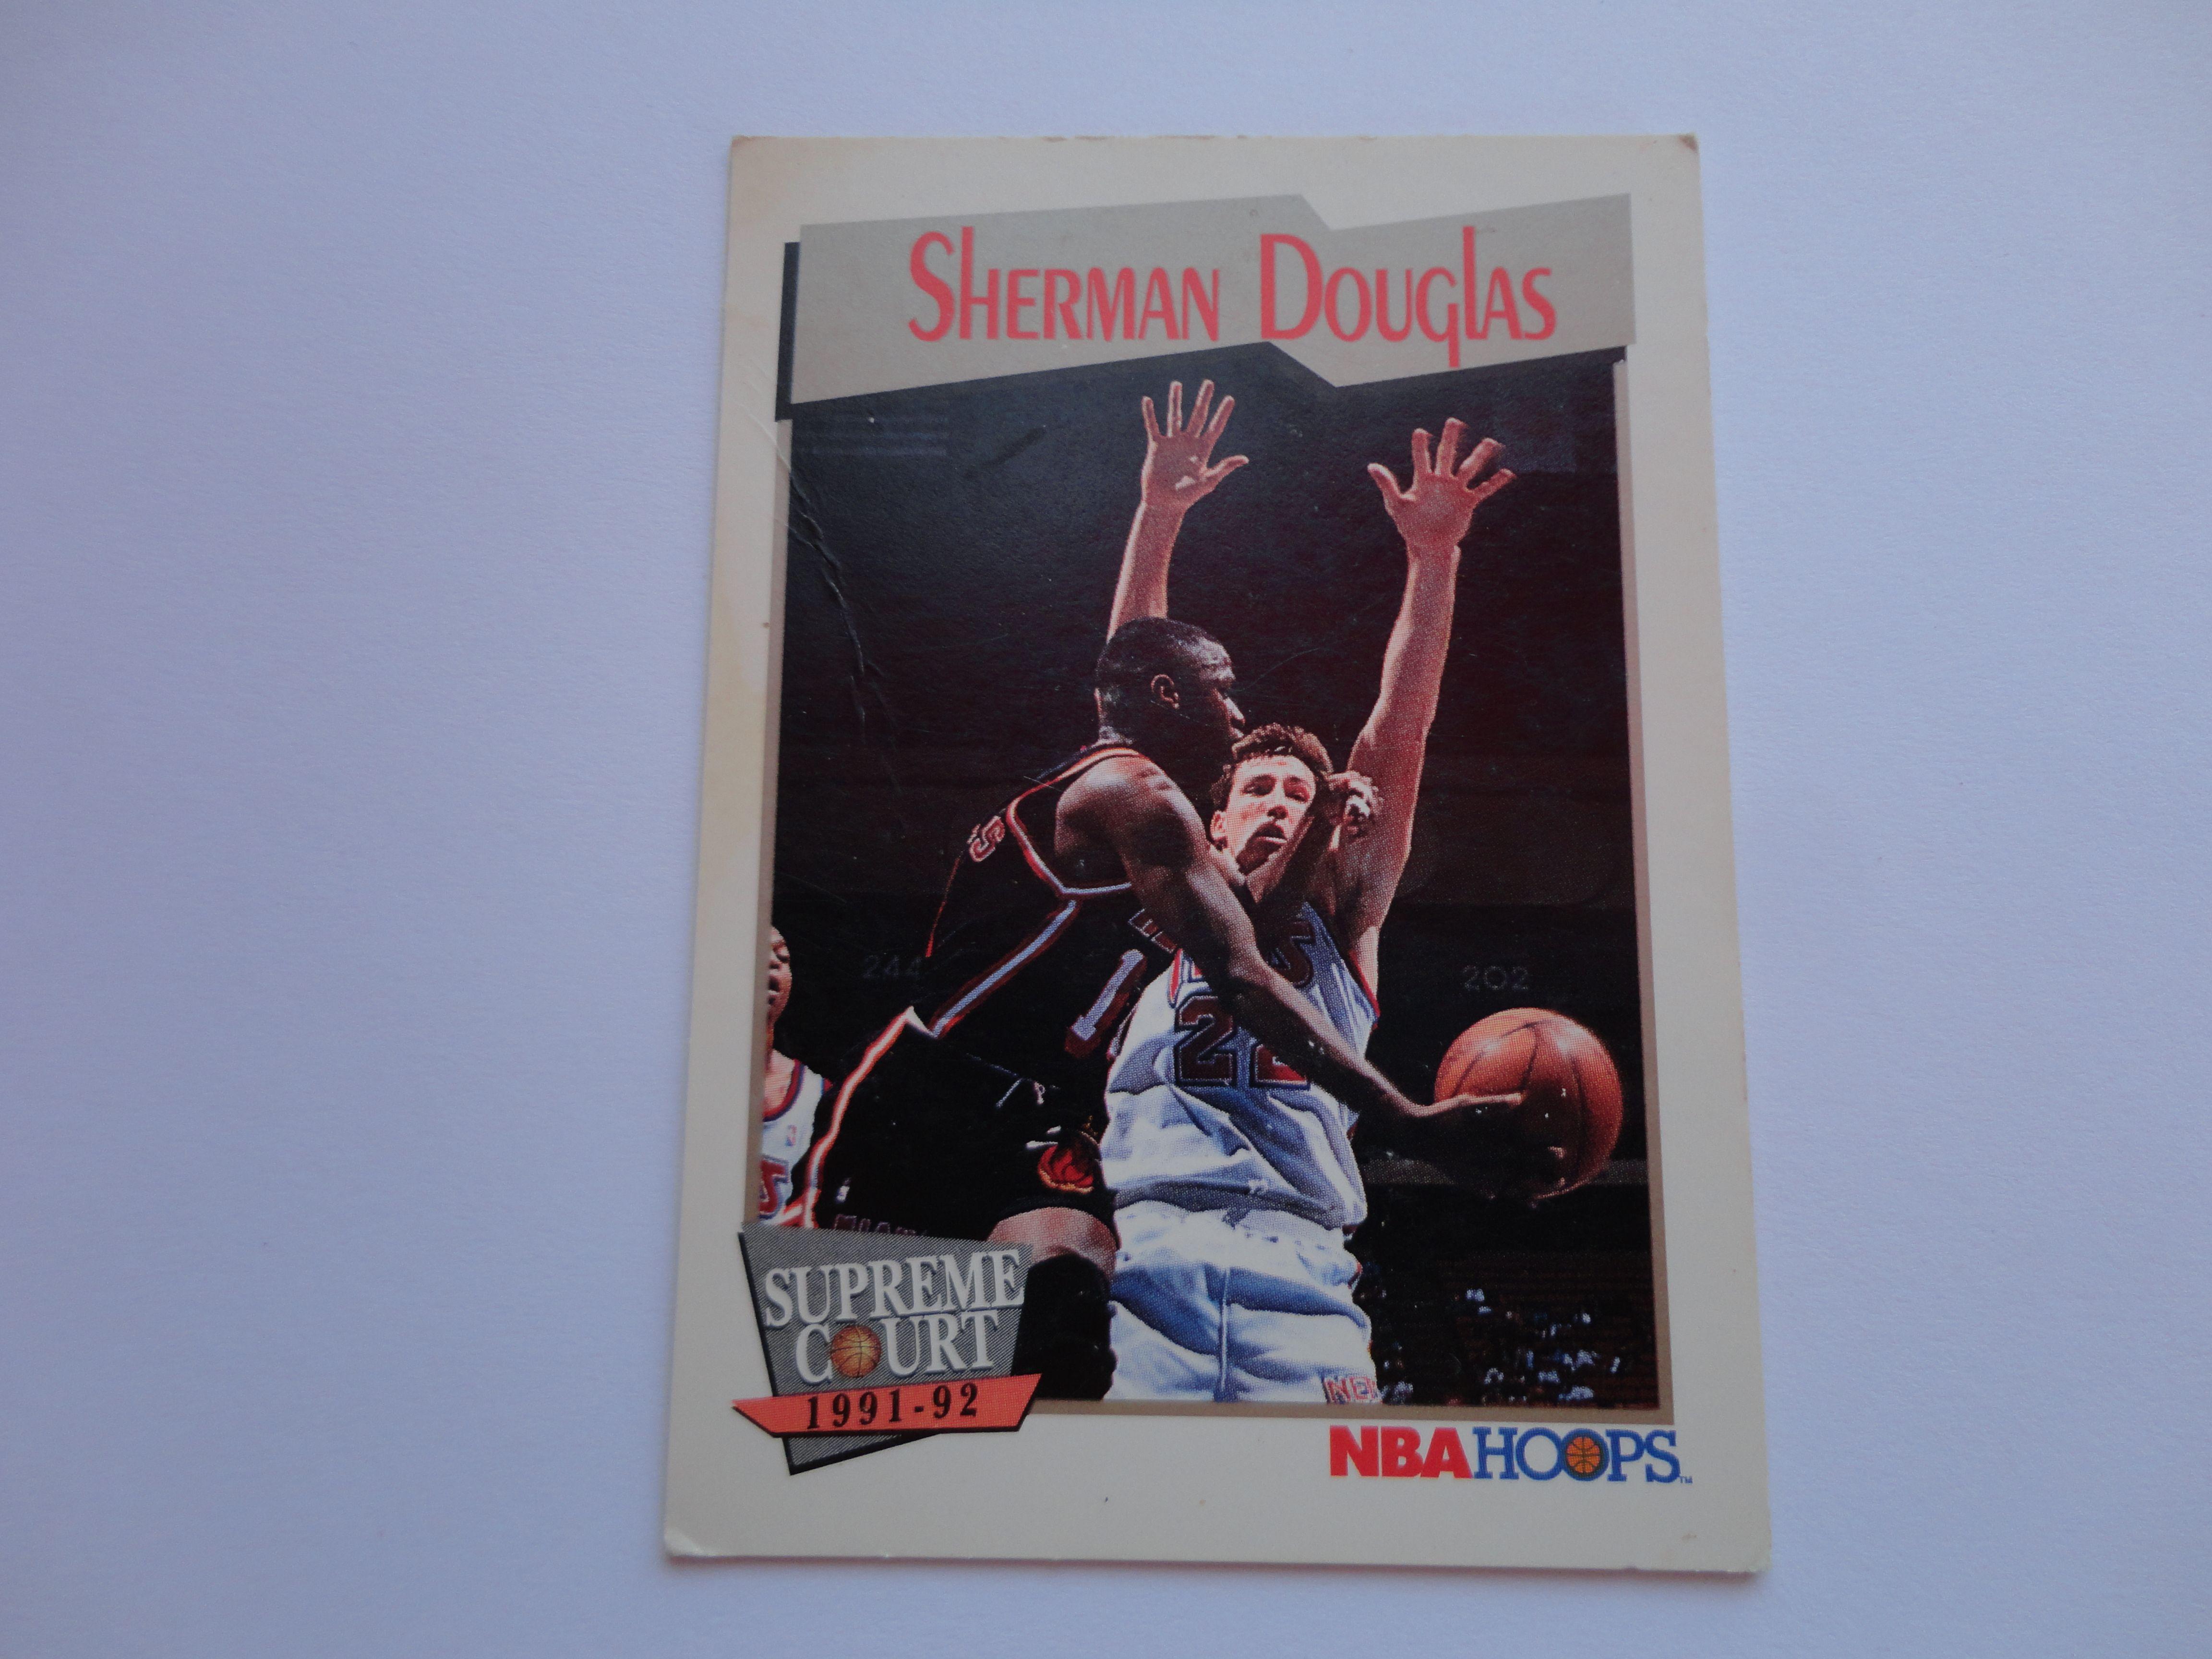 Sherman Douglas NBA Hoops Supreme Court 1991 92 Basketball Card